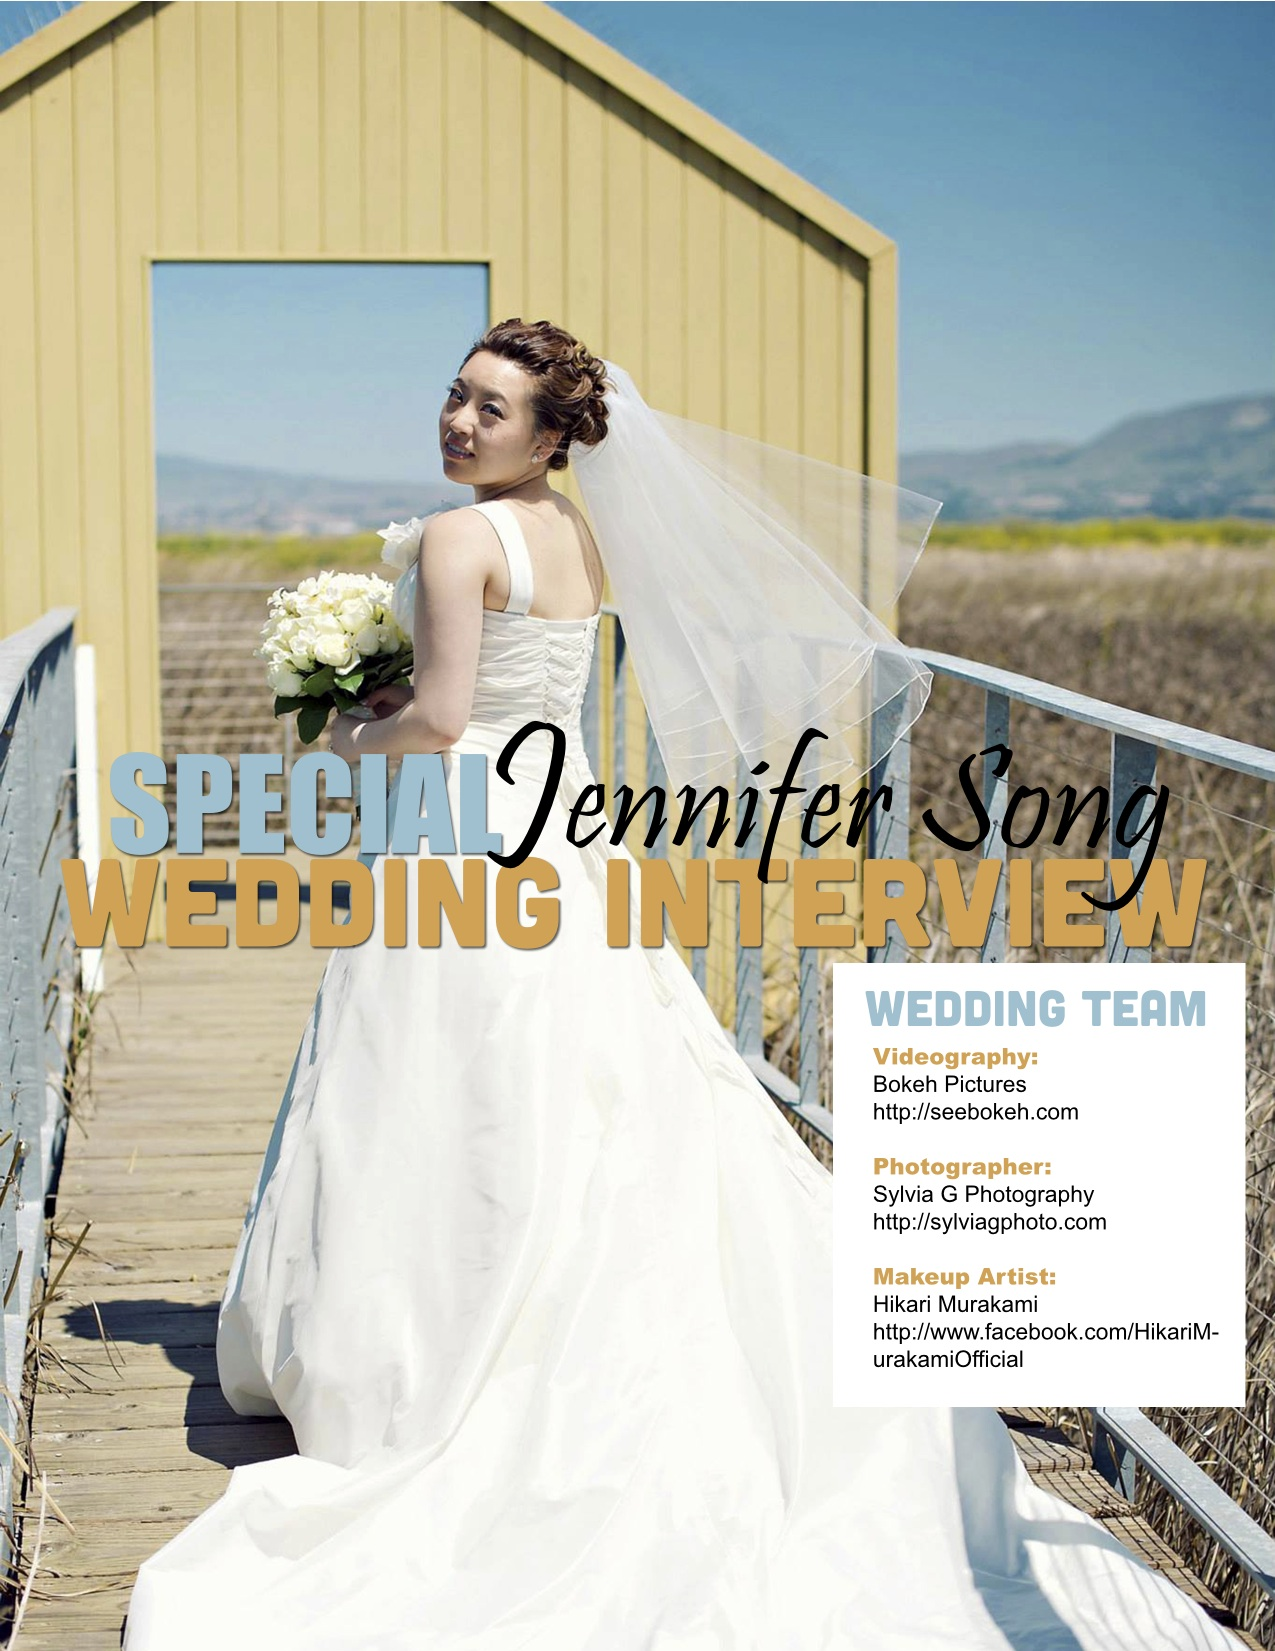 Jennifer-wedding-layout.jpg